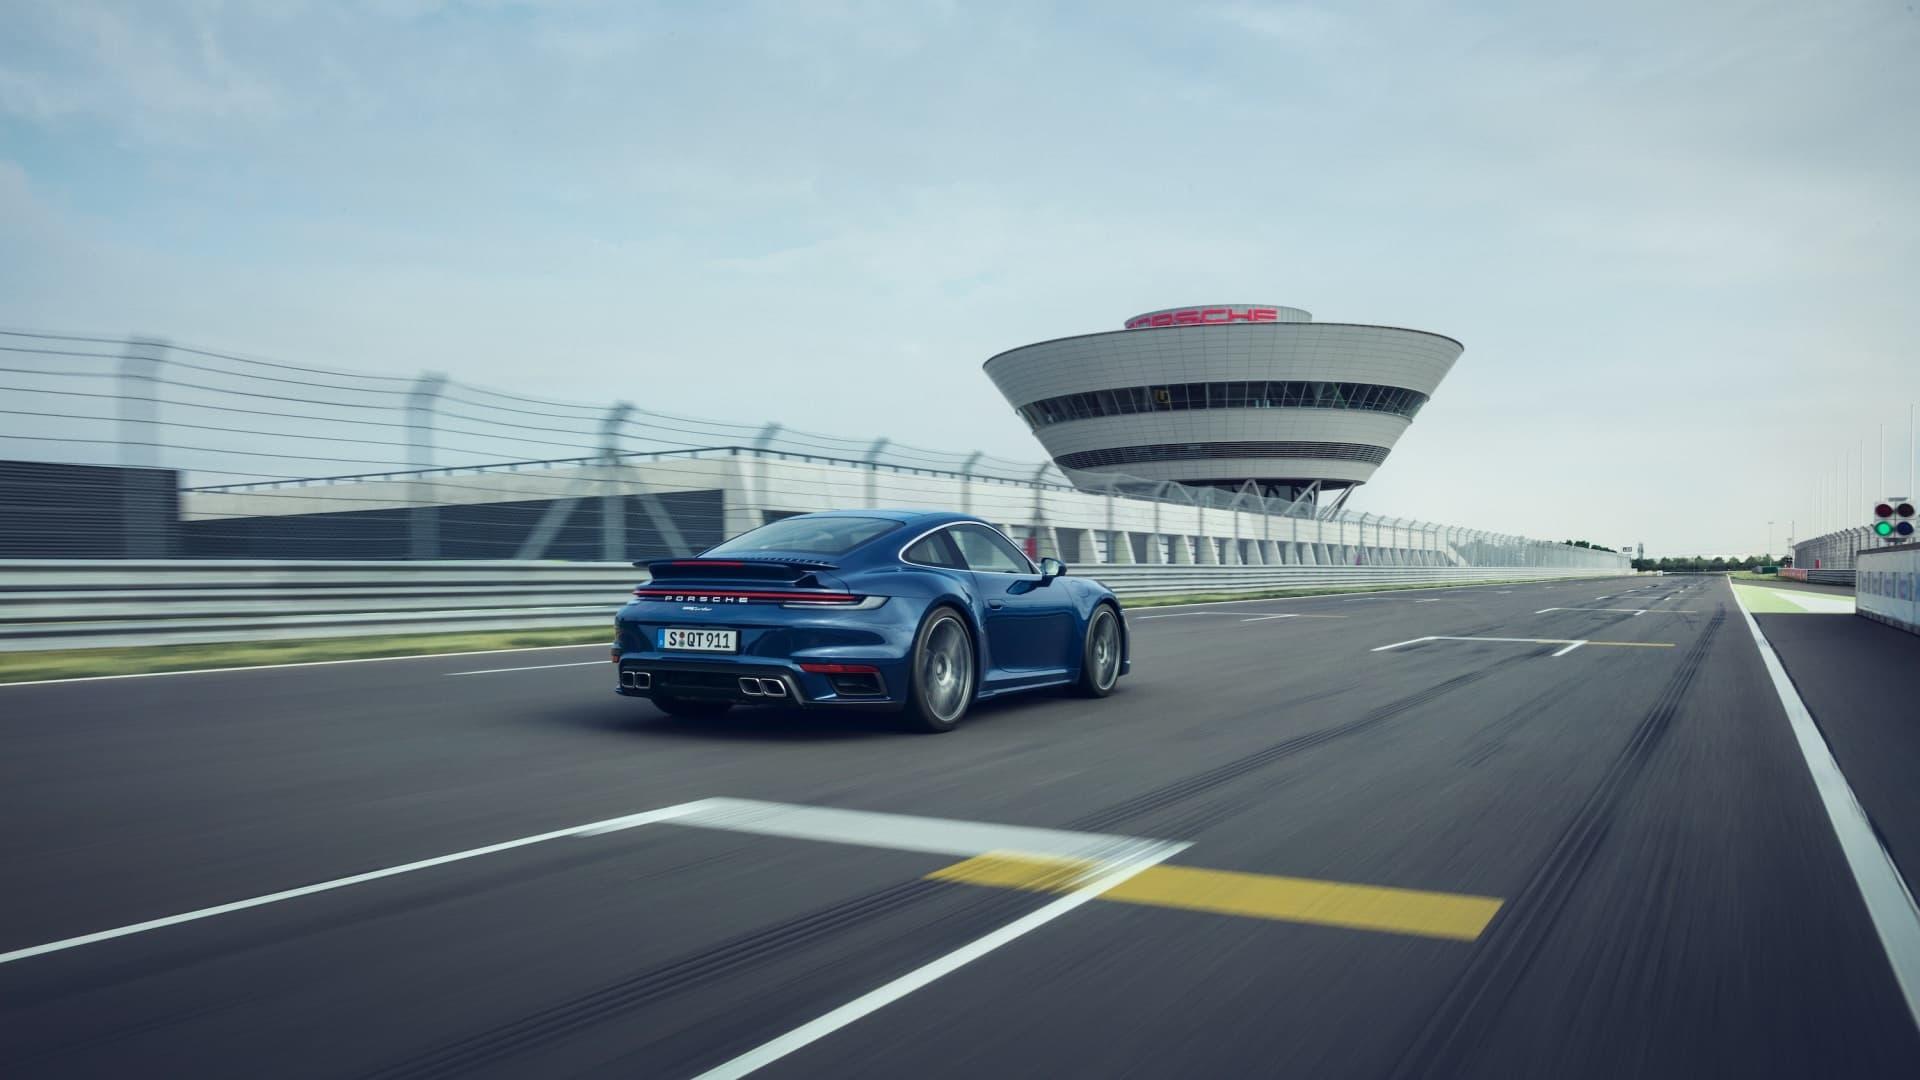 Porsche 911 Turbo 2020 Img 3